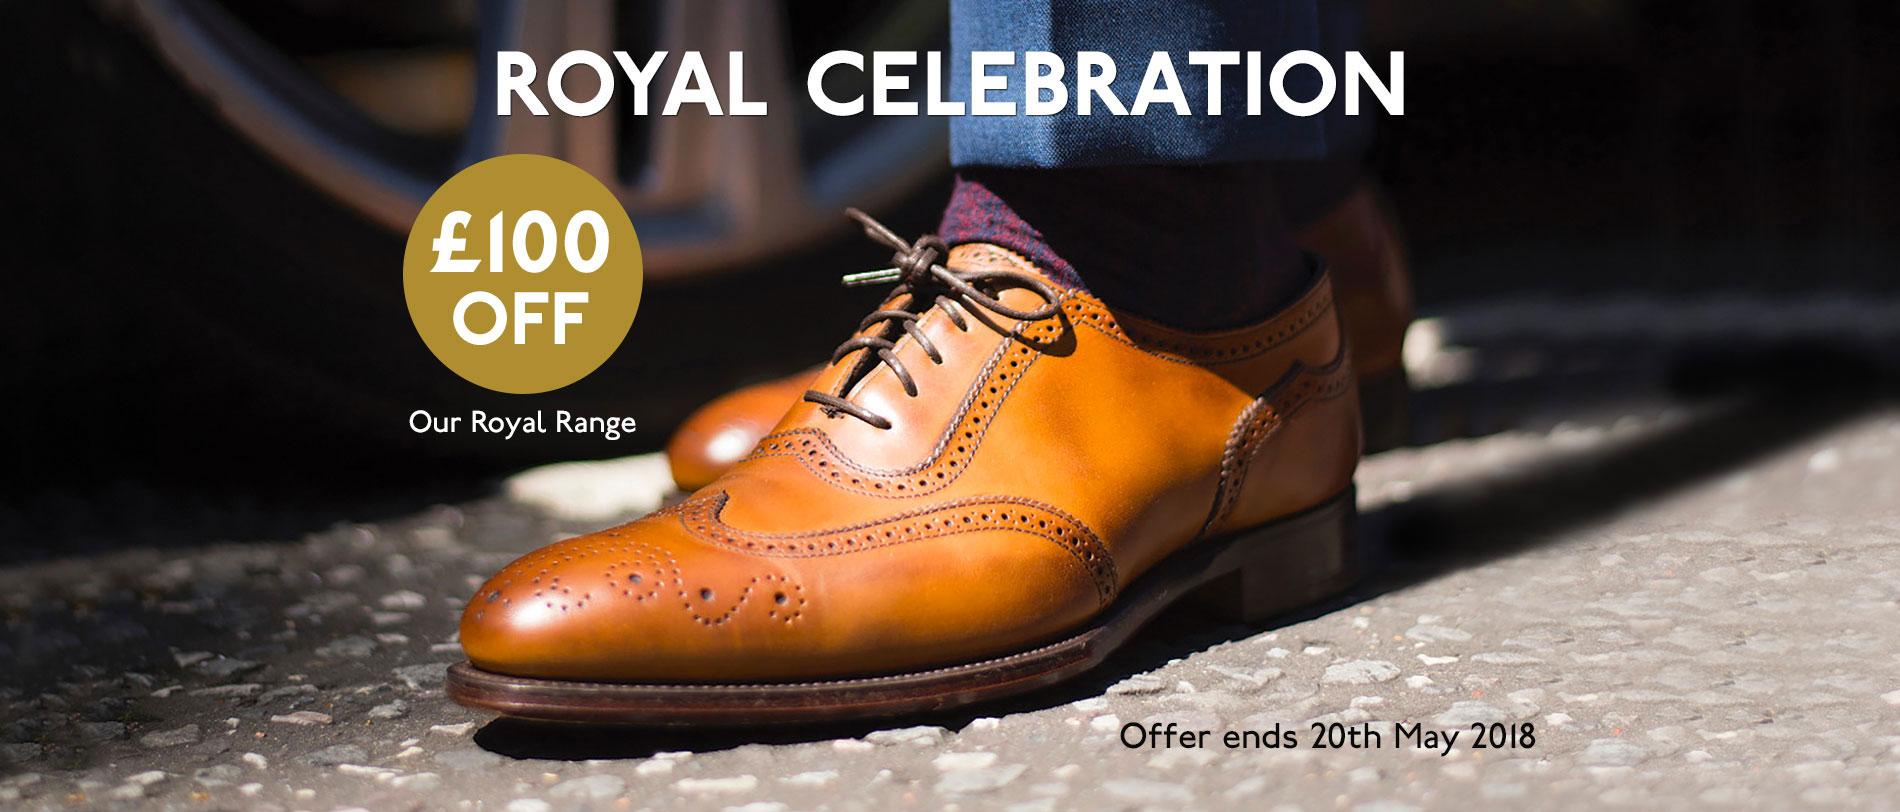 Royal Celebration Offer